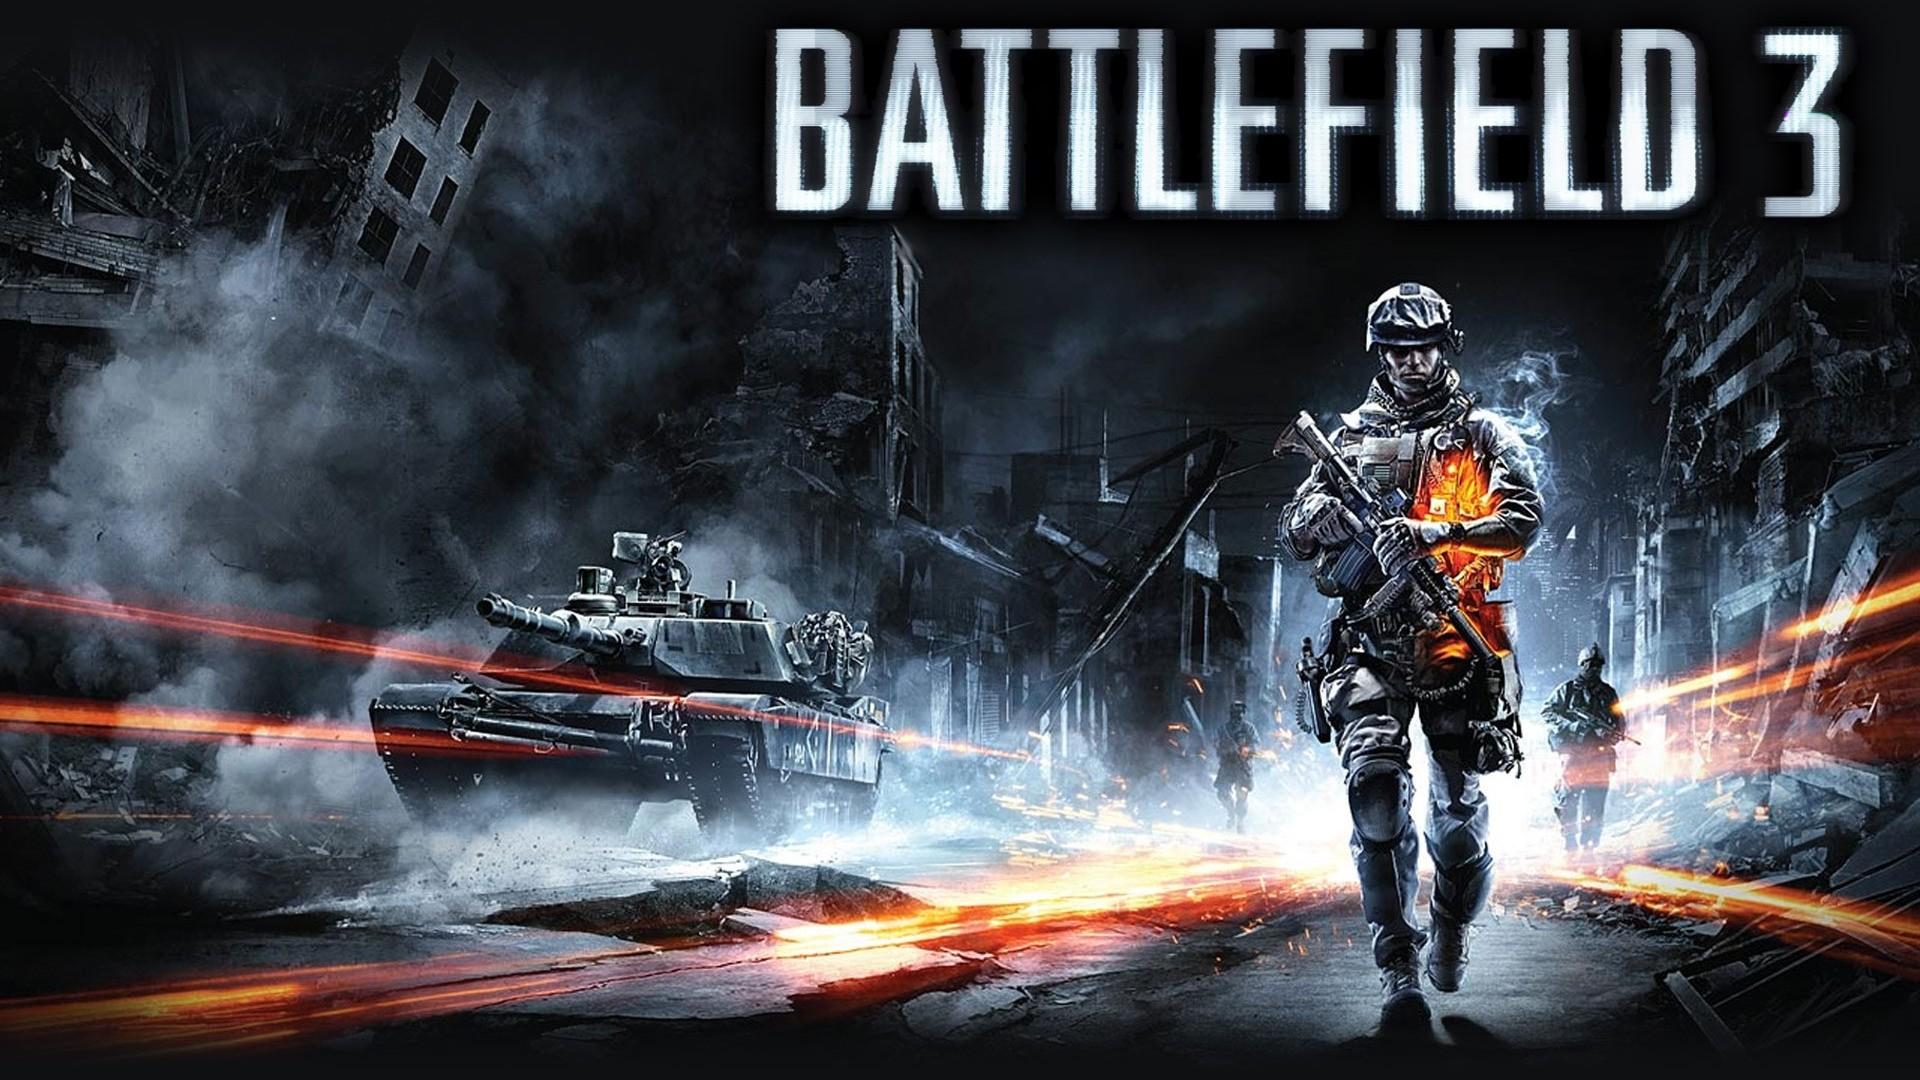 Res: 1920x1080, http://2.bp.blogspot.com/-JVtffJqgp7U/UFFjG5v9HnI. Battlefield 3 - High  Definition Wallpapers ...